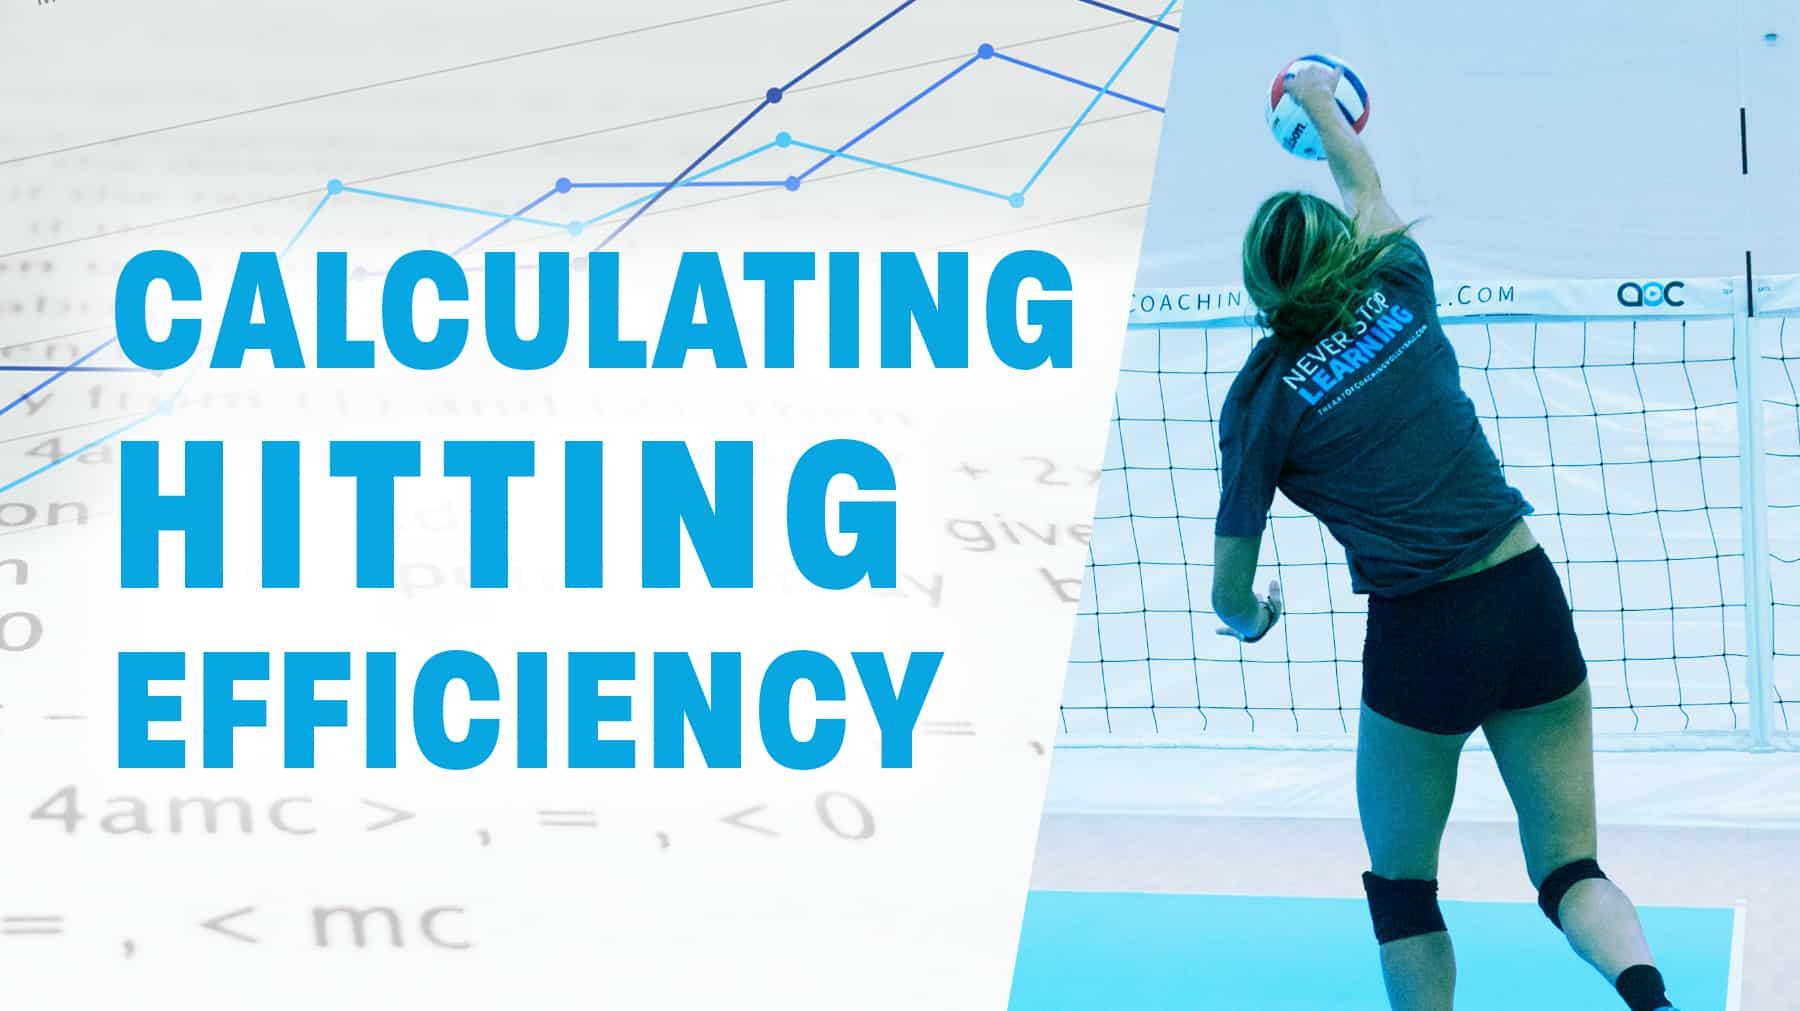 Calculating Hitting Efficiency